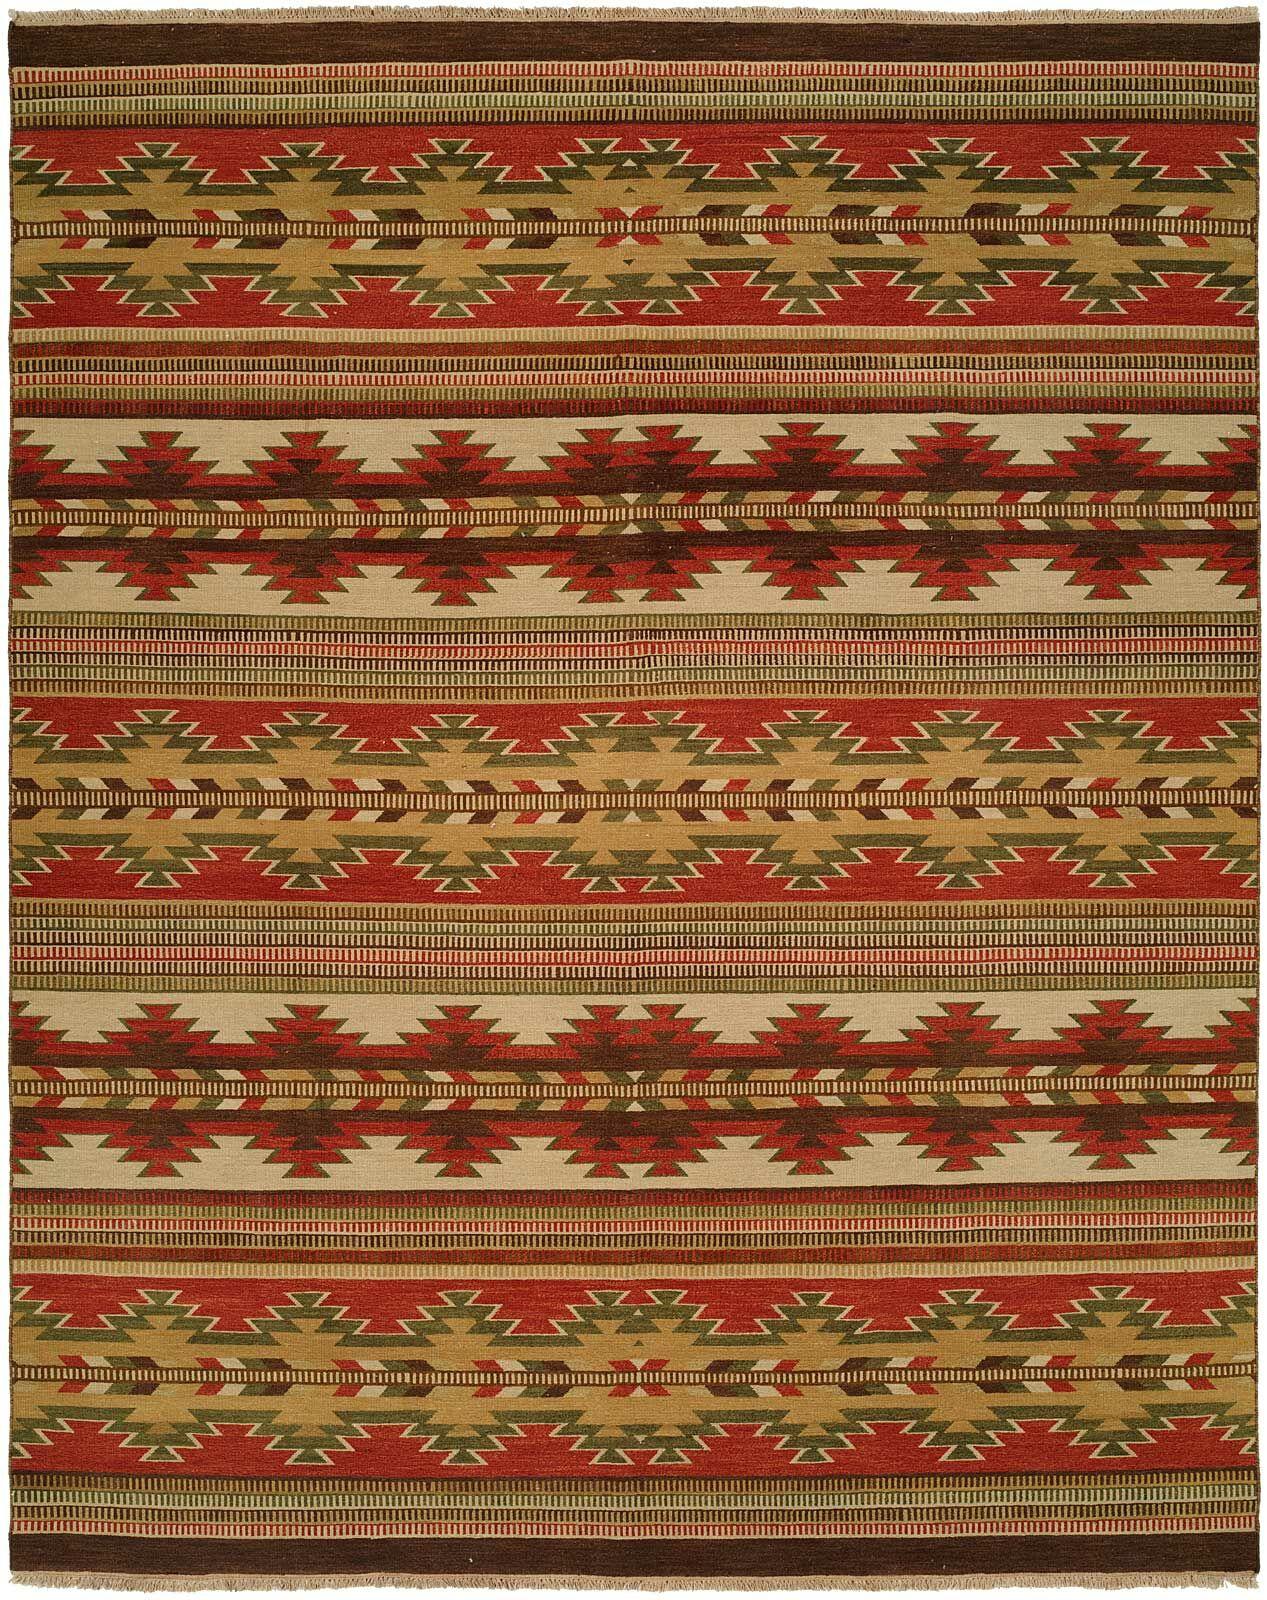 Hangu Red/Beige Area Rug Rug Size: Rectangle 6' x 9'